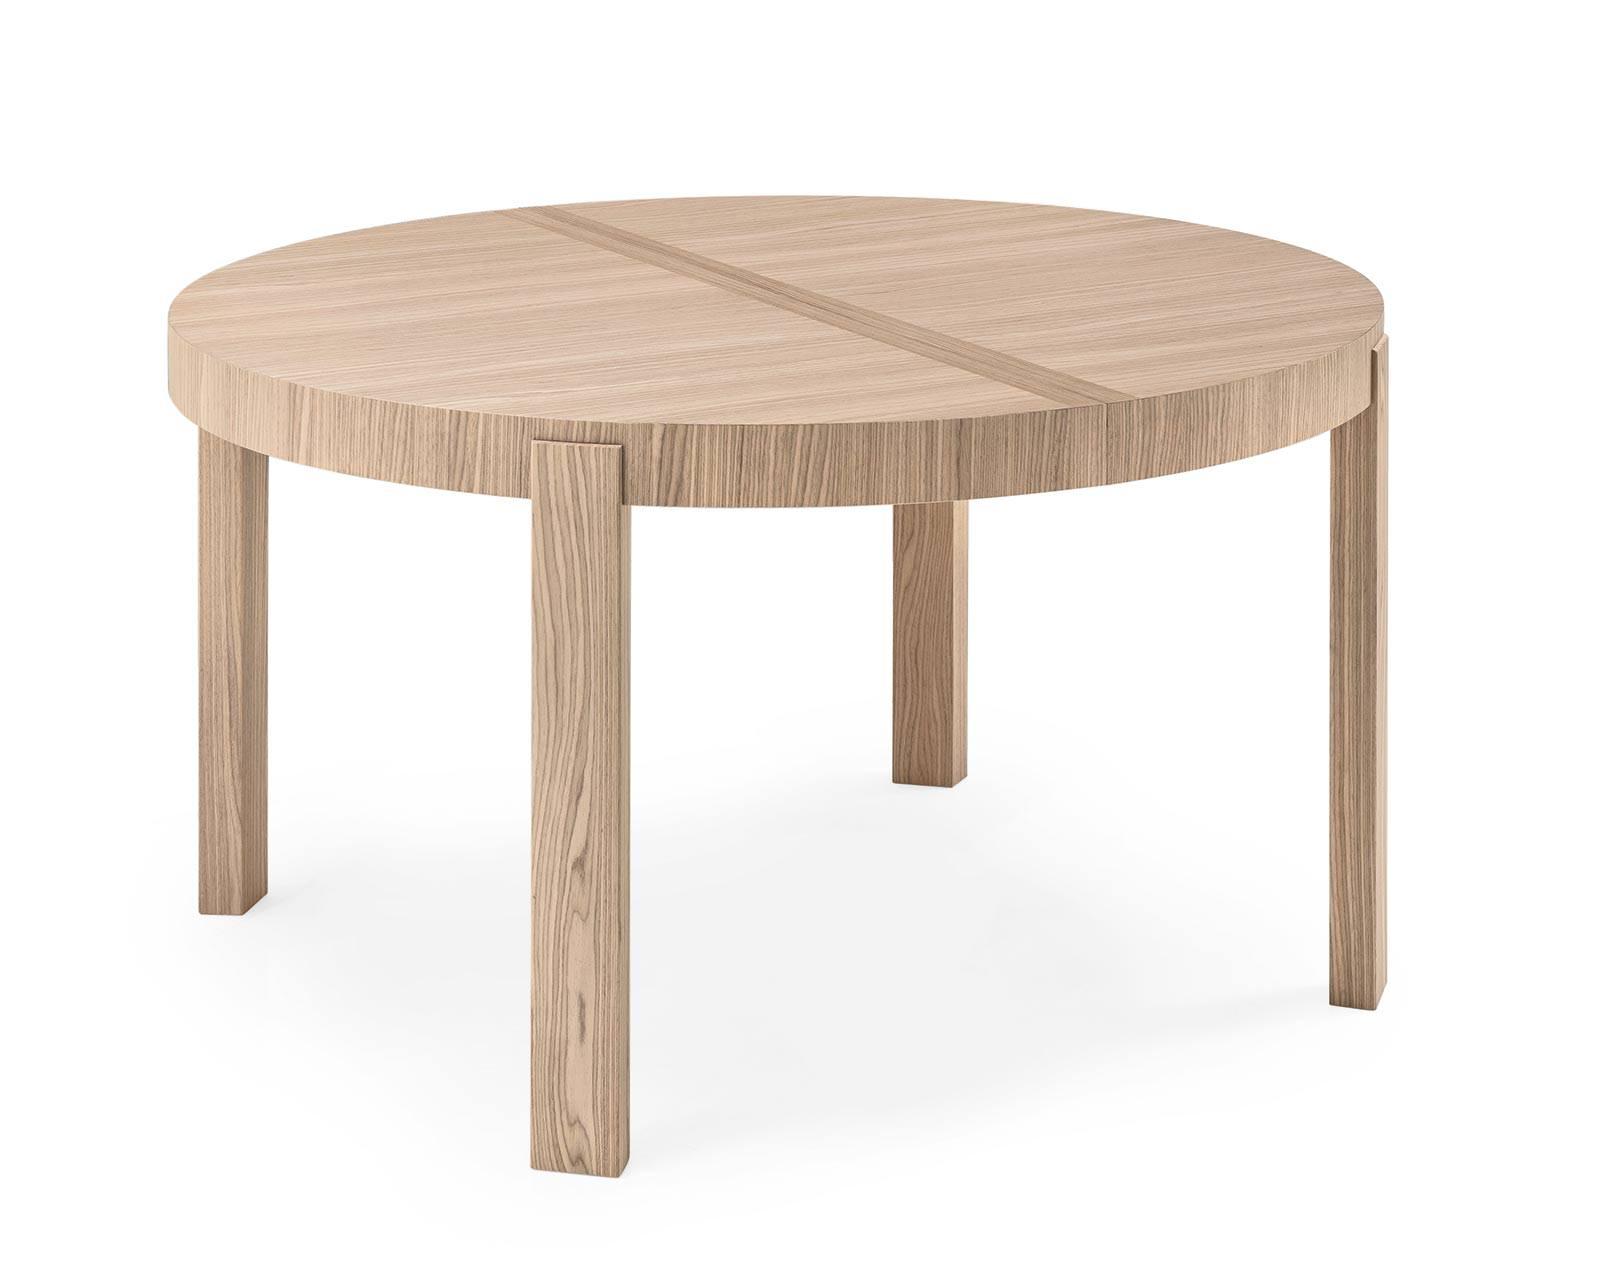 5 tavoli rotondi allungabili for Tavoli allungabili calligaris prezzi